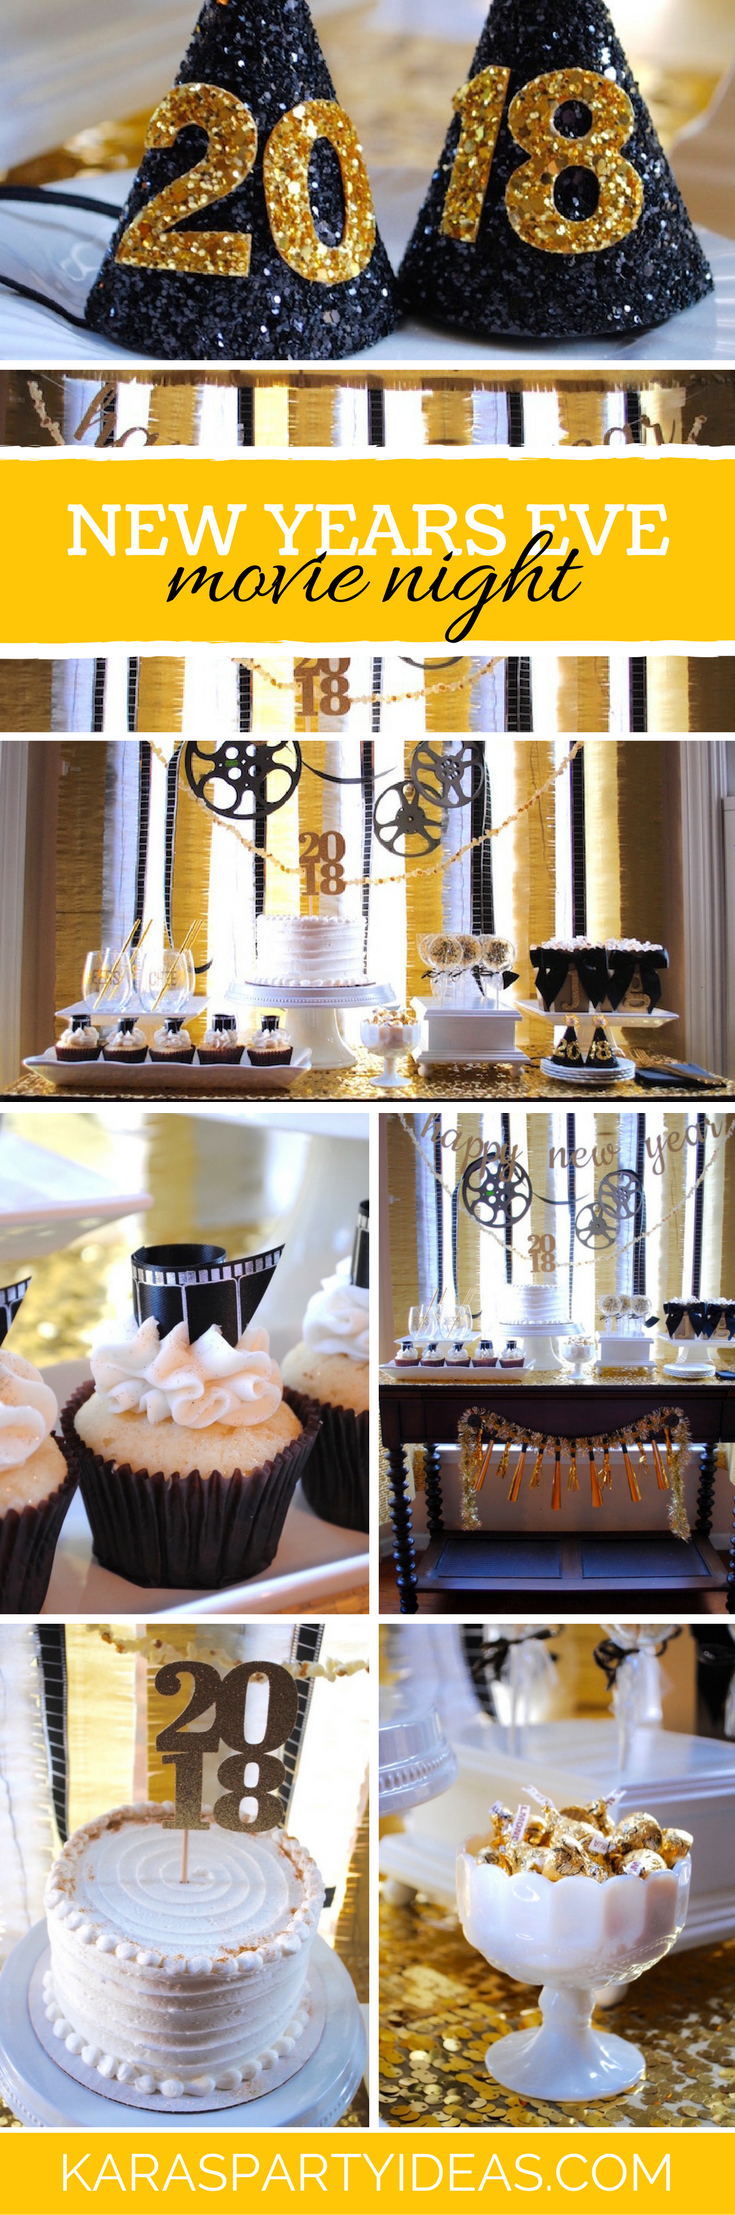 NYE Movie Night Party via Kara's Party Ideas - KarasPartyIdeas.com